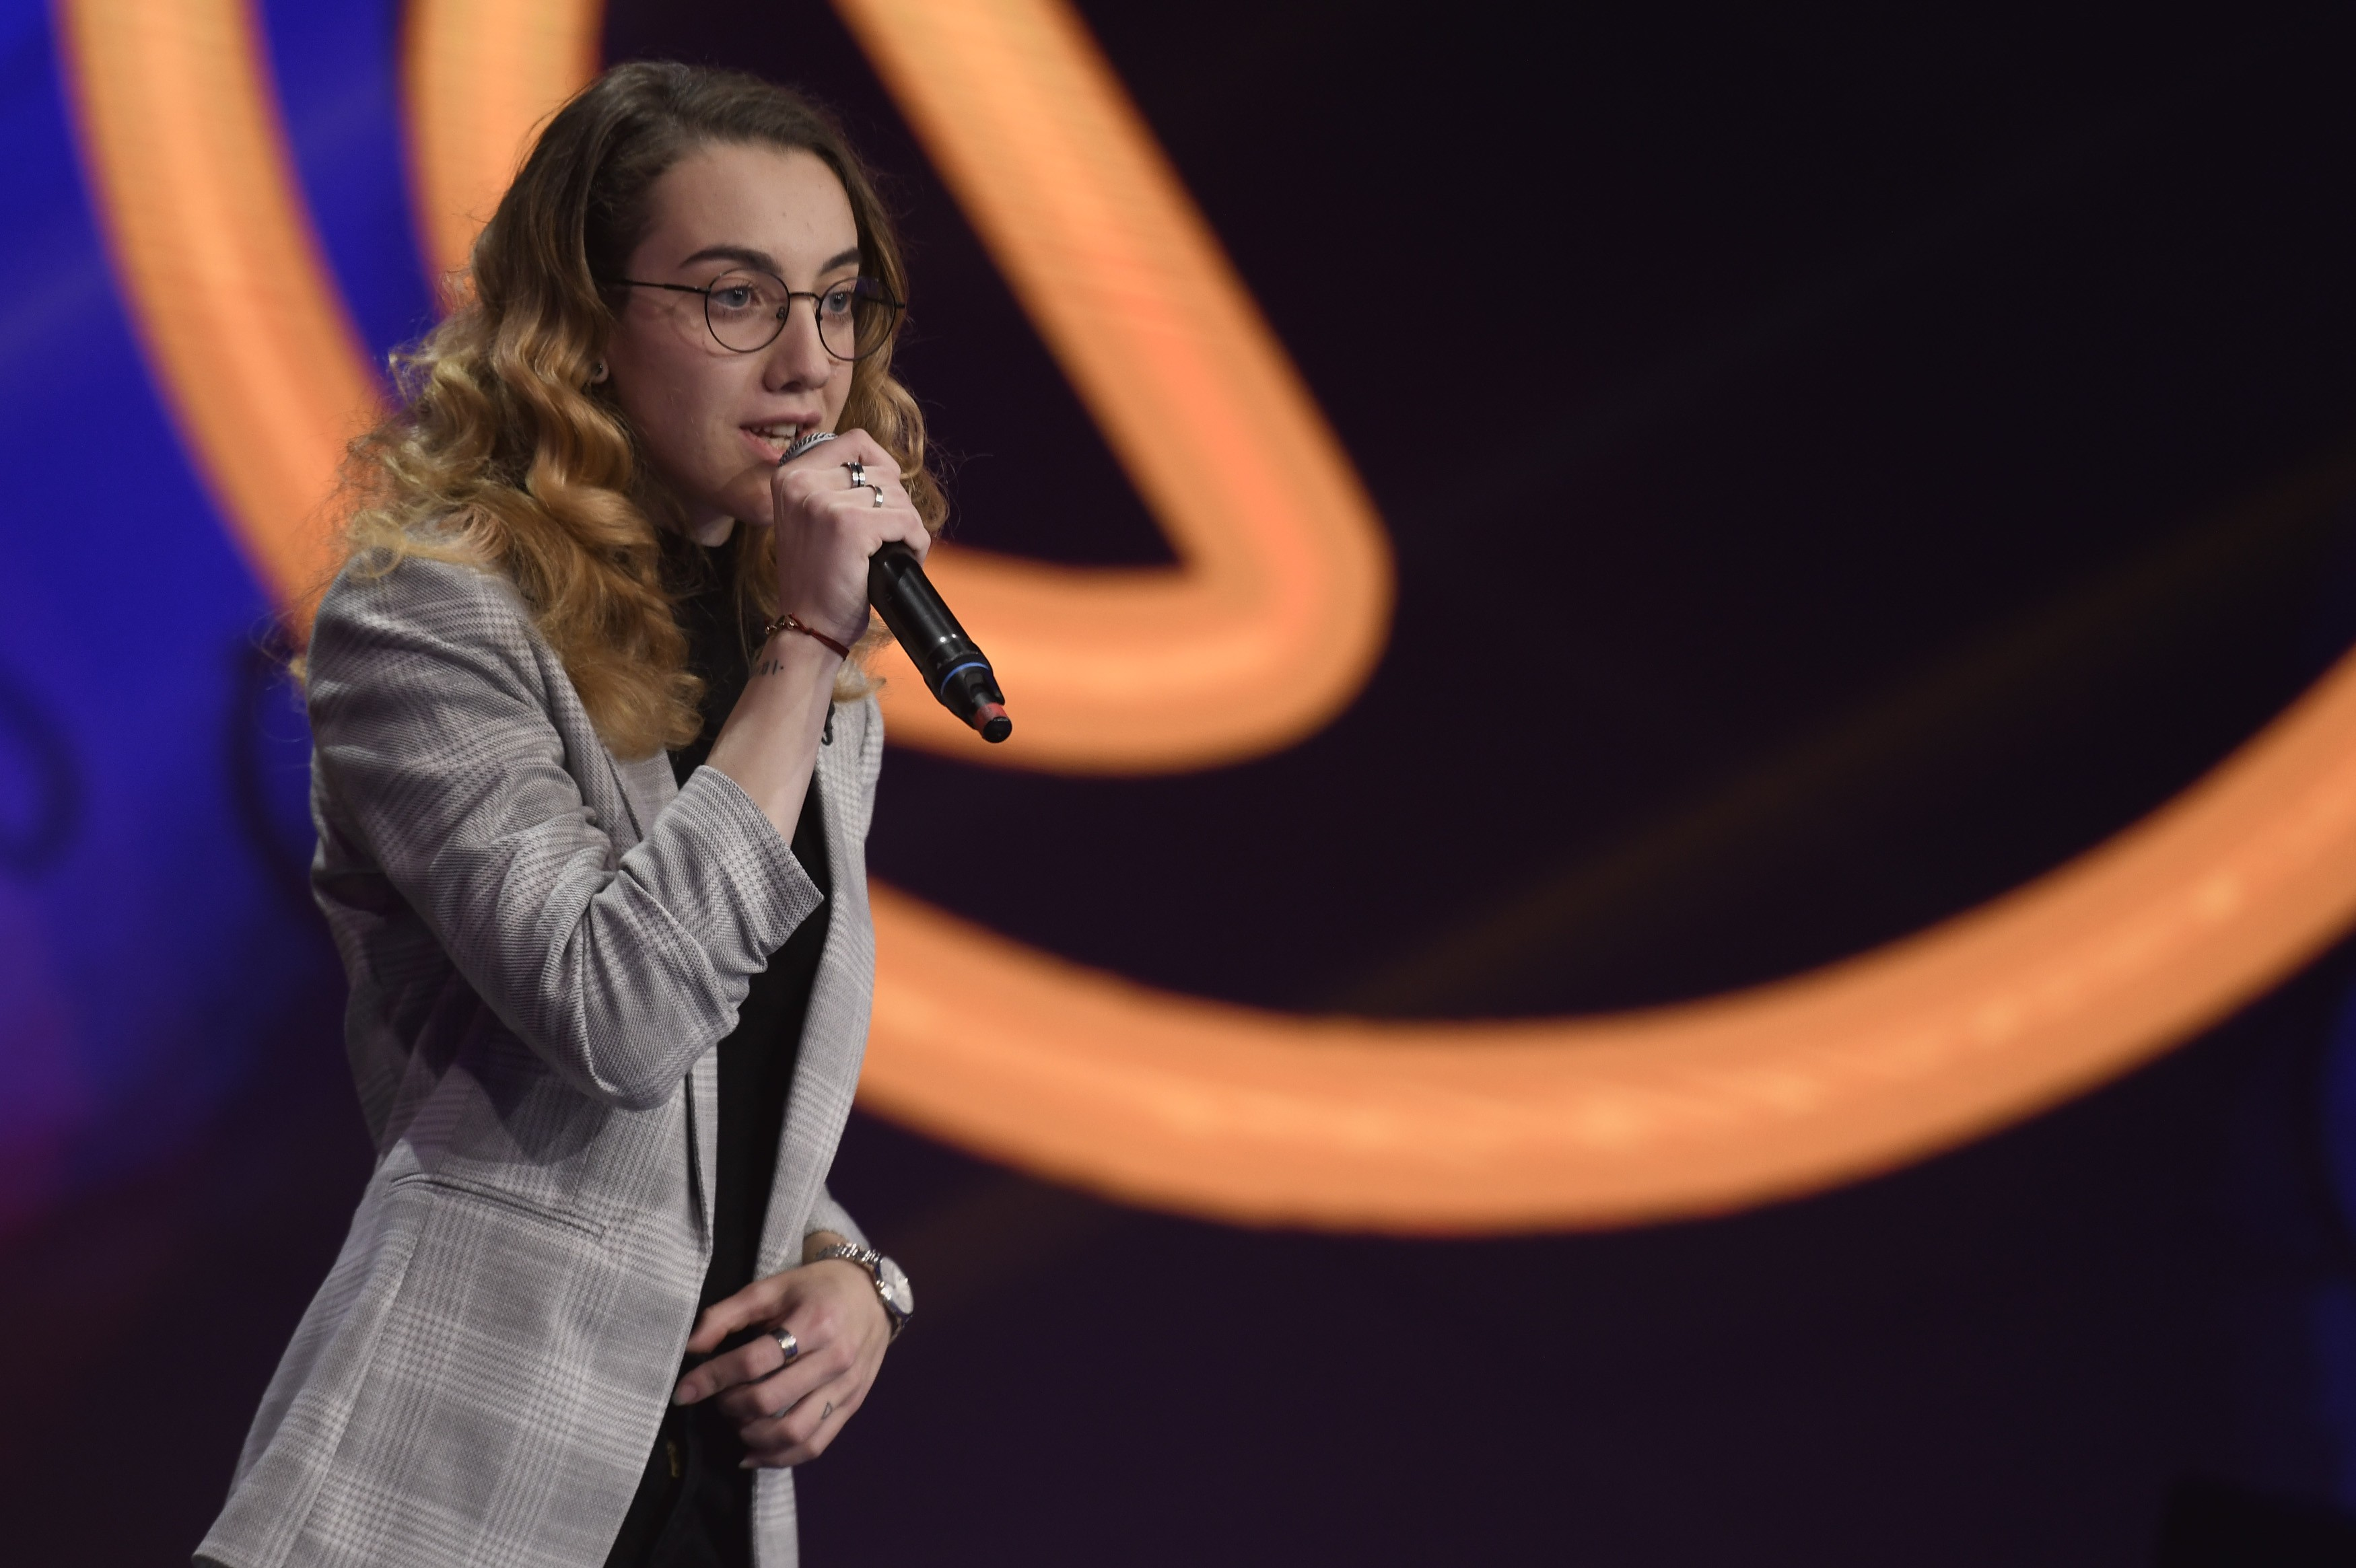 Semifinala iUmor 2020: Mihaela Pripici, stand-up comedy